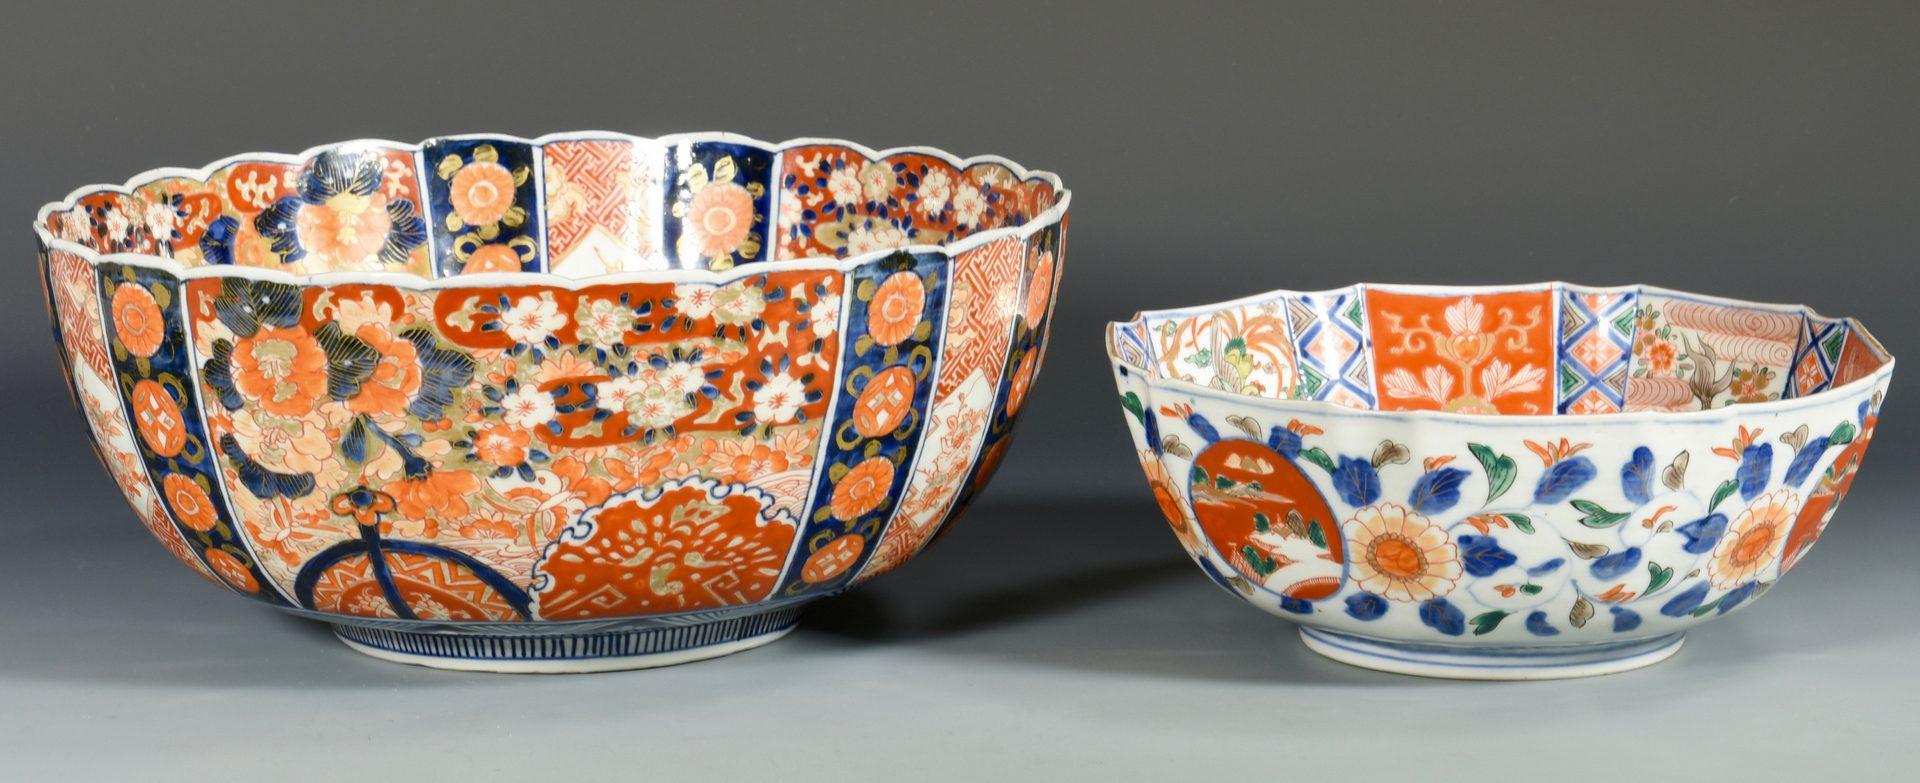 Lot 338: Group of Japanese Imari Porcelain, 8 items